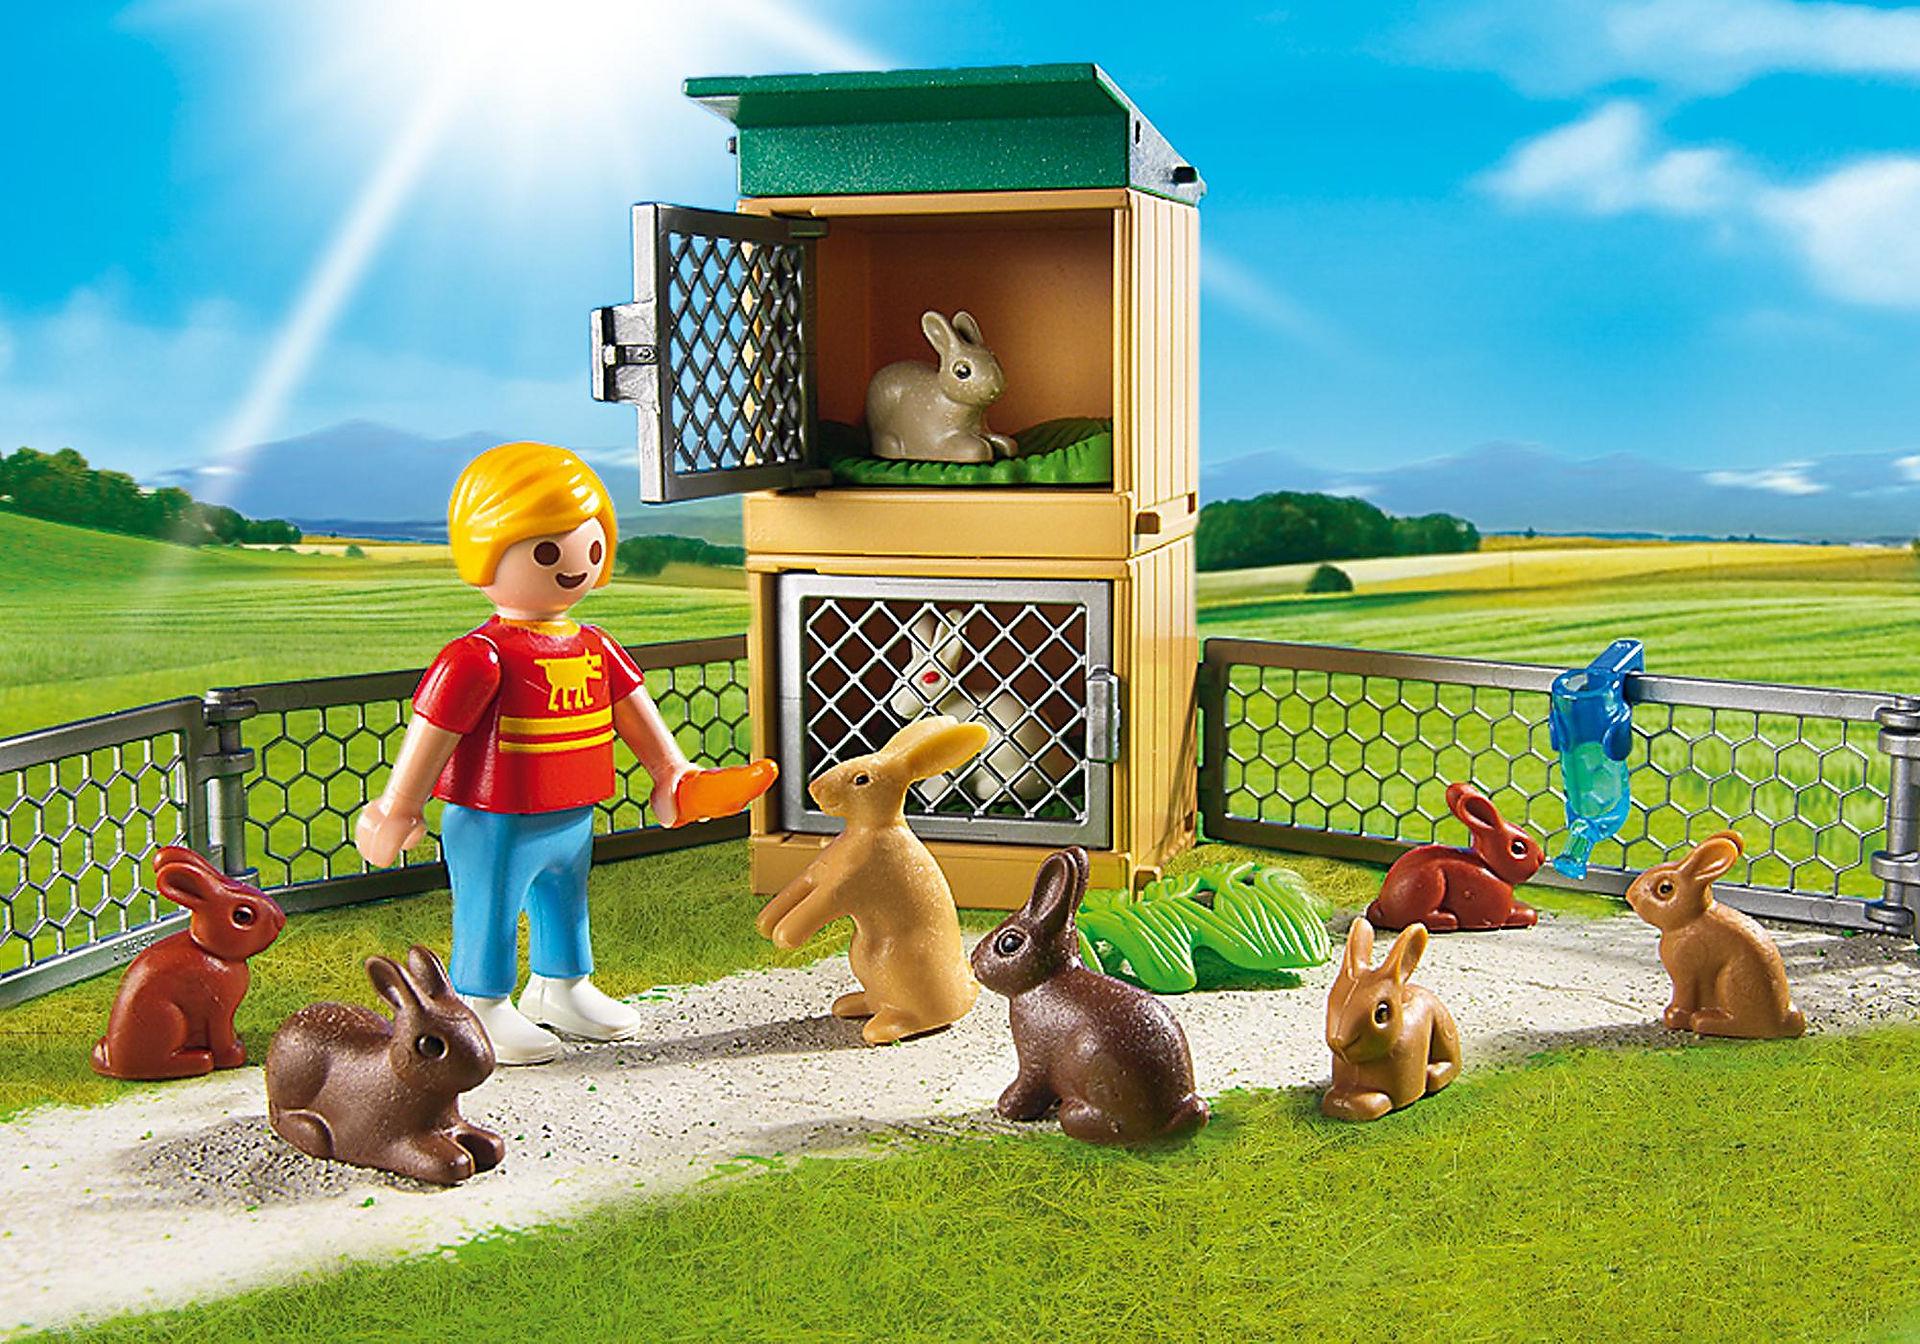 http://media.playmobil.com/i/playmobil/6140_product_extra1/Enfant avec enclos à lapins et clapier